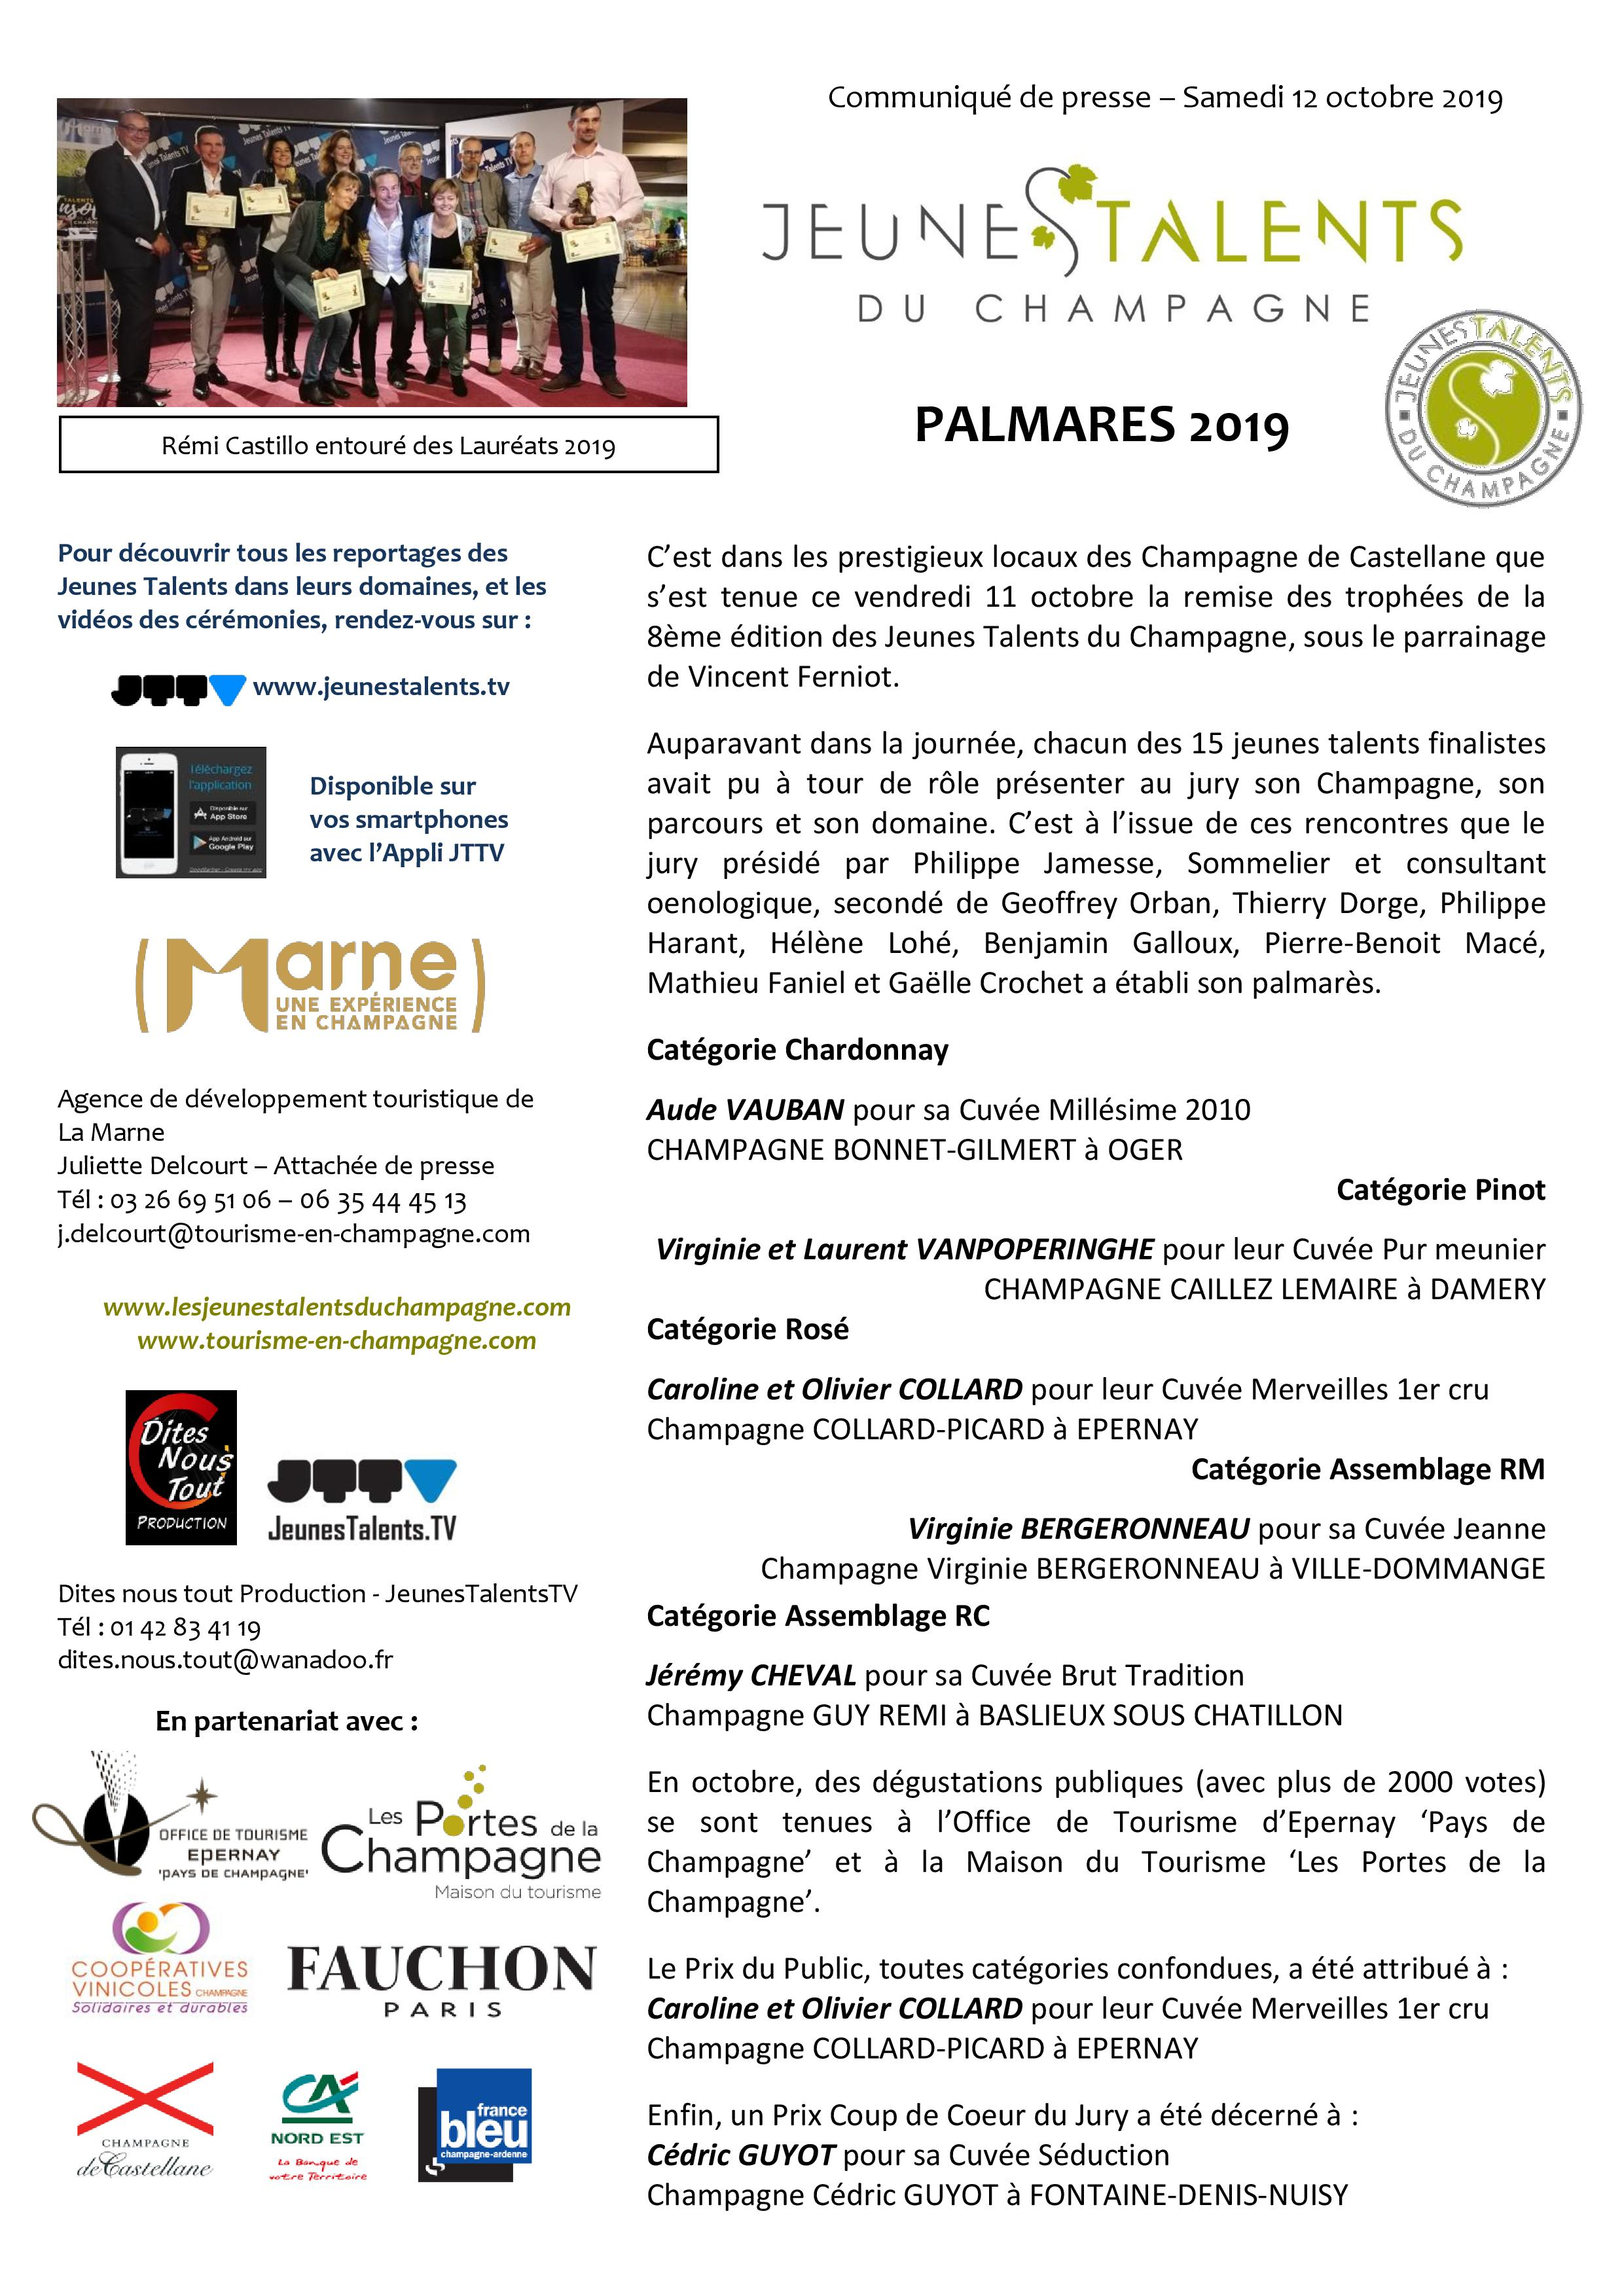 CP PALMARES JT CHAMPAGNE 2019